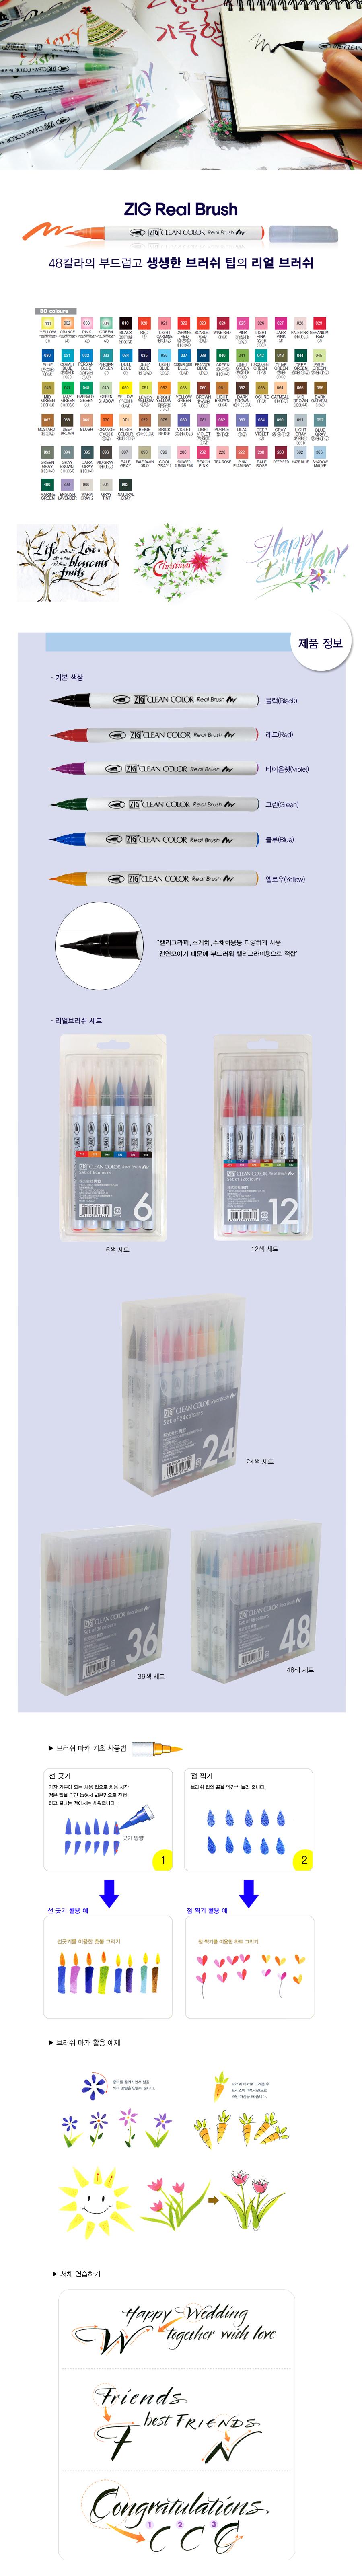 ZIG 리얼 브러쉬 펜(24색 세트) - 오피스디포, 66,600원, 데코펜, 데코펜 세트